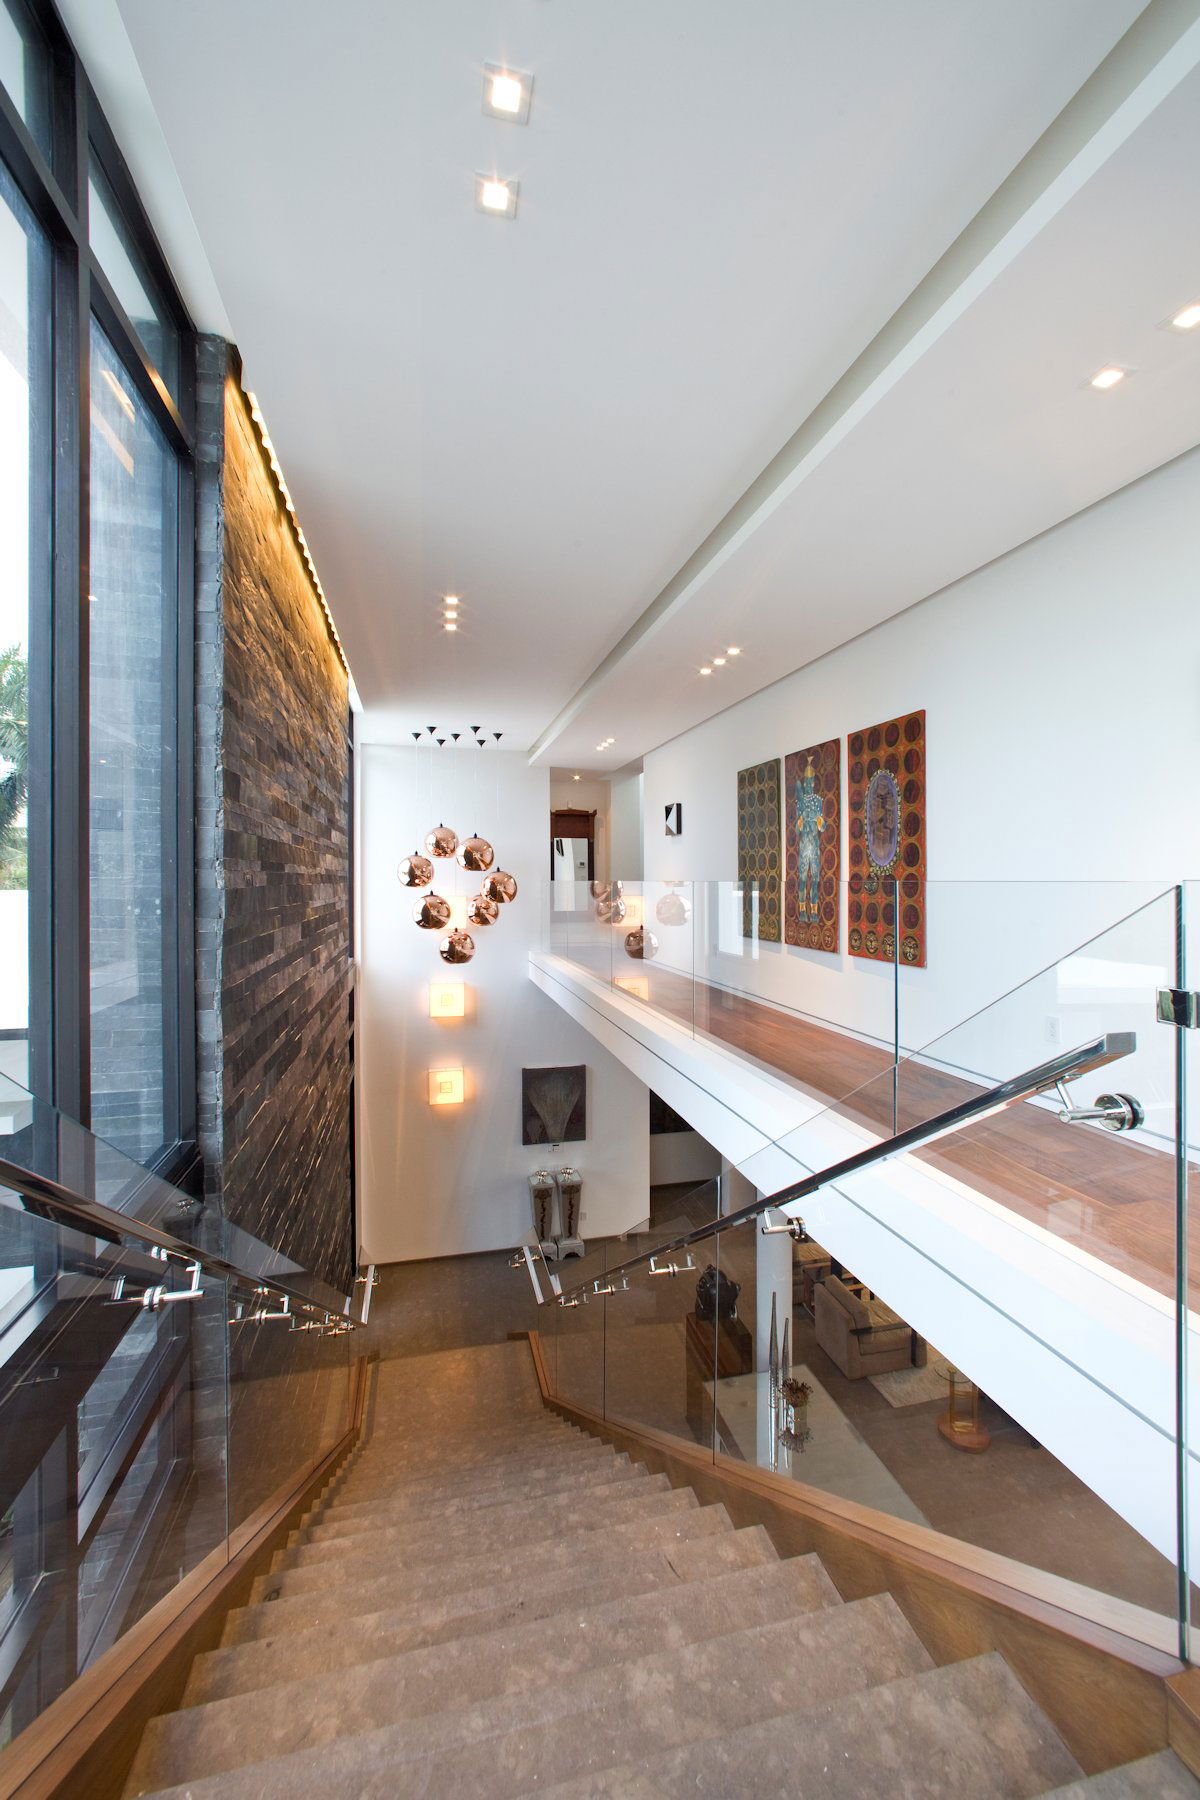 Pendant Lighting, Stairs, Modern Home in Golden Beach, Florida